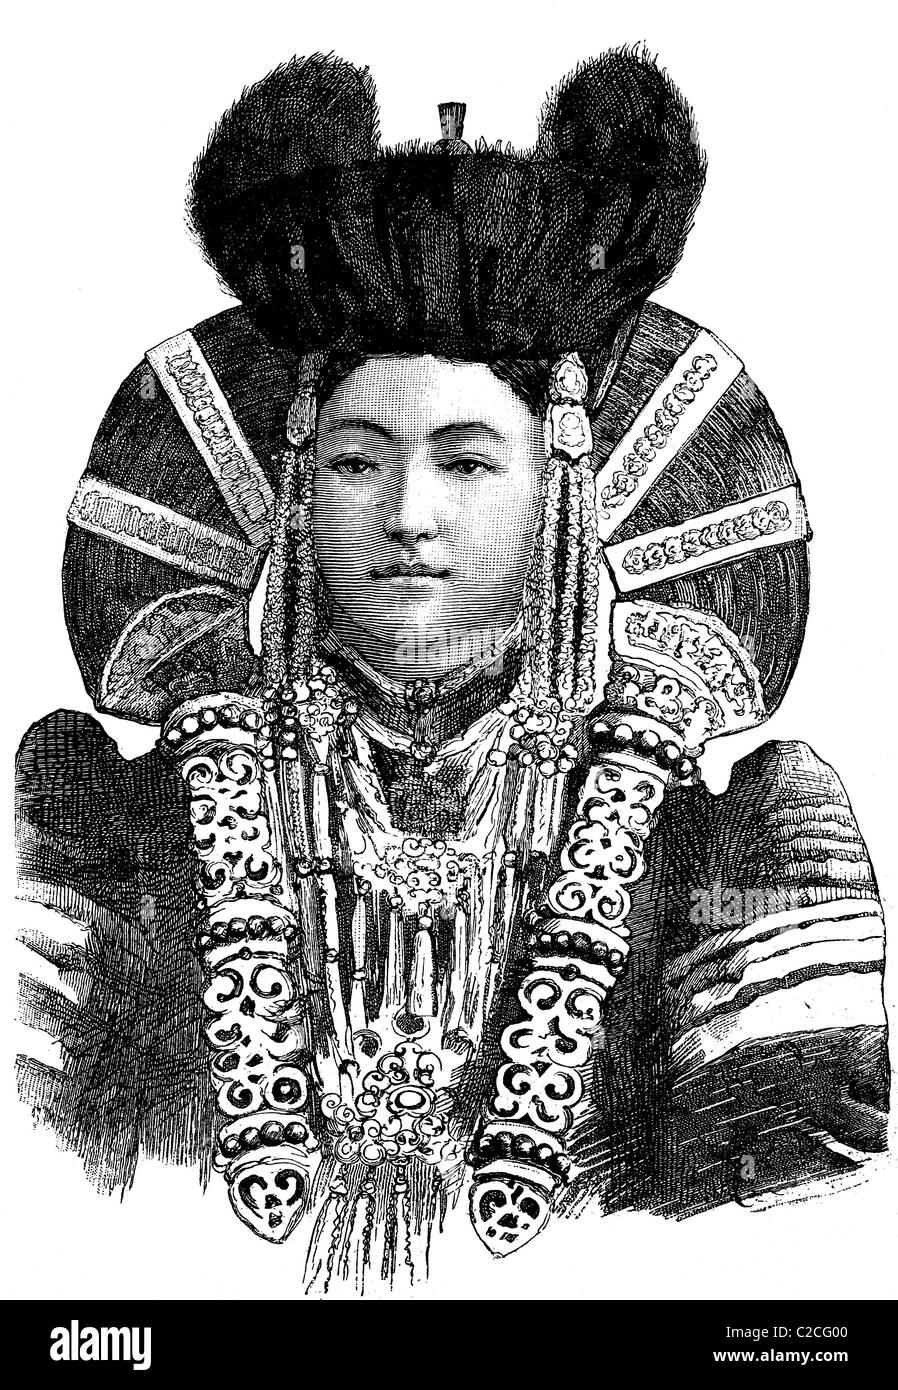 Women from Urga, Mongolia, historical illustration circa 1893 - Stock Image